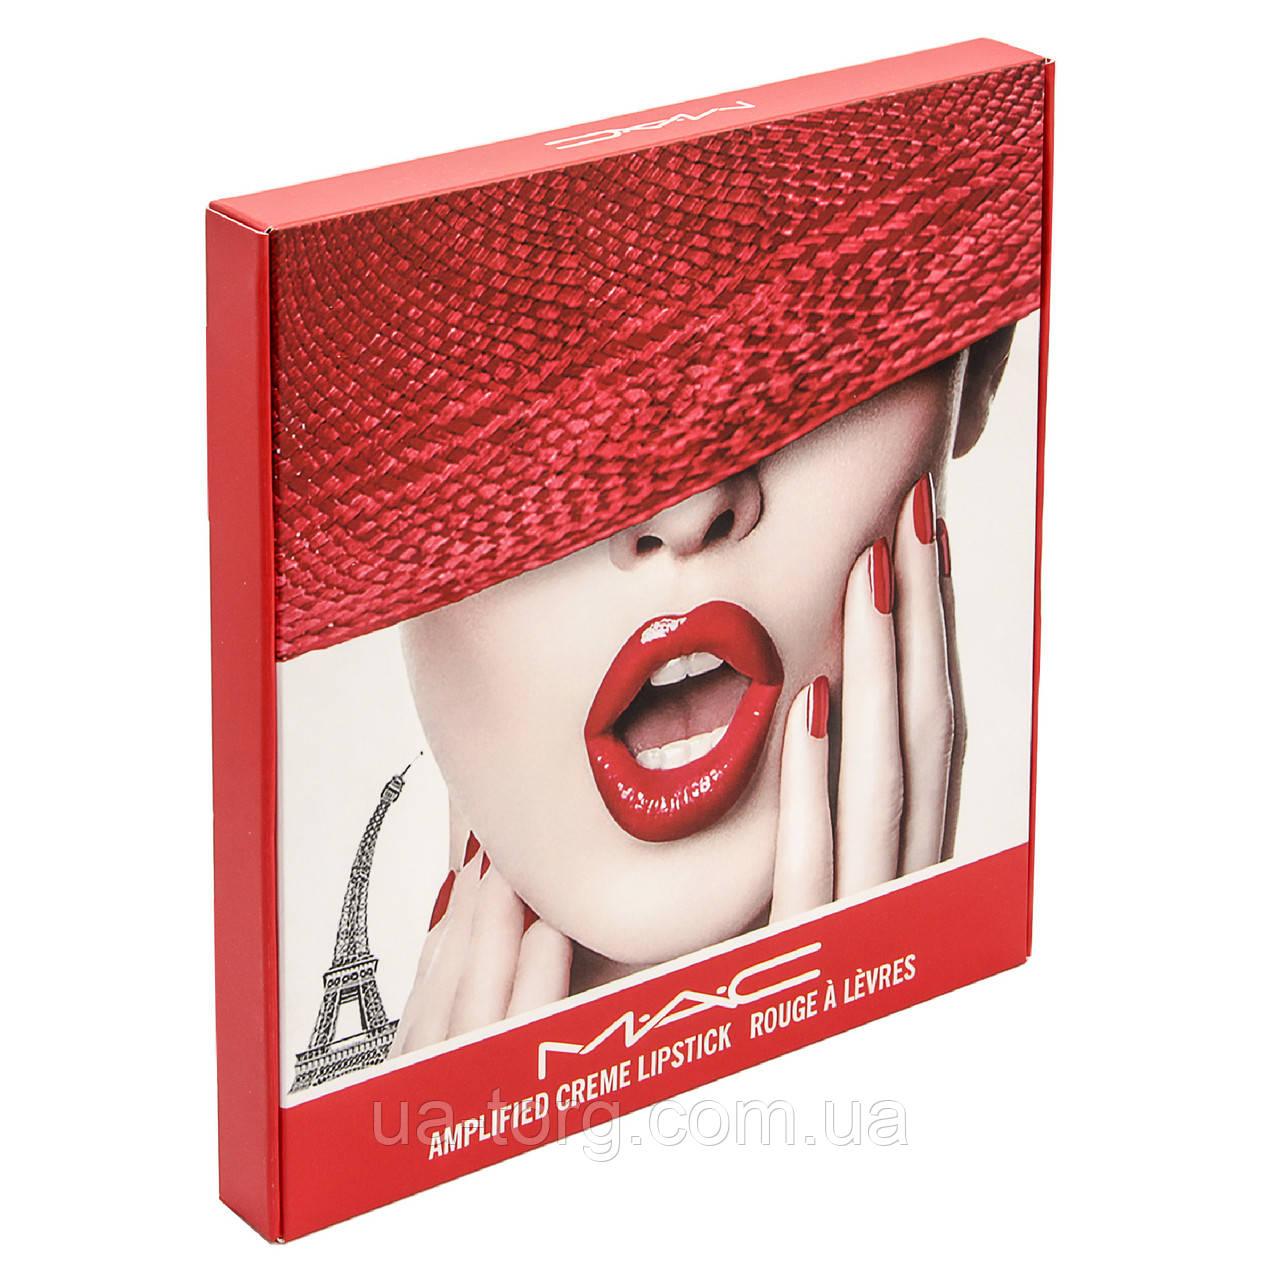 Набор помад для губ MAC Amplified  Lipstick Rouge a Levres